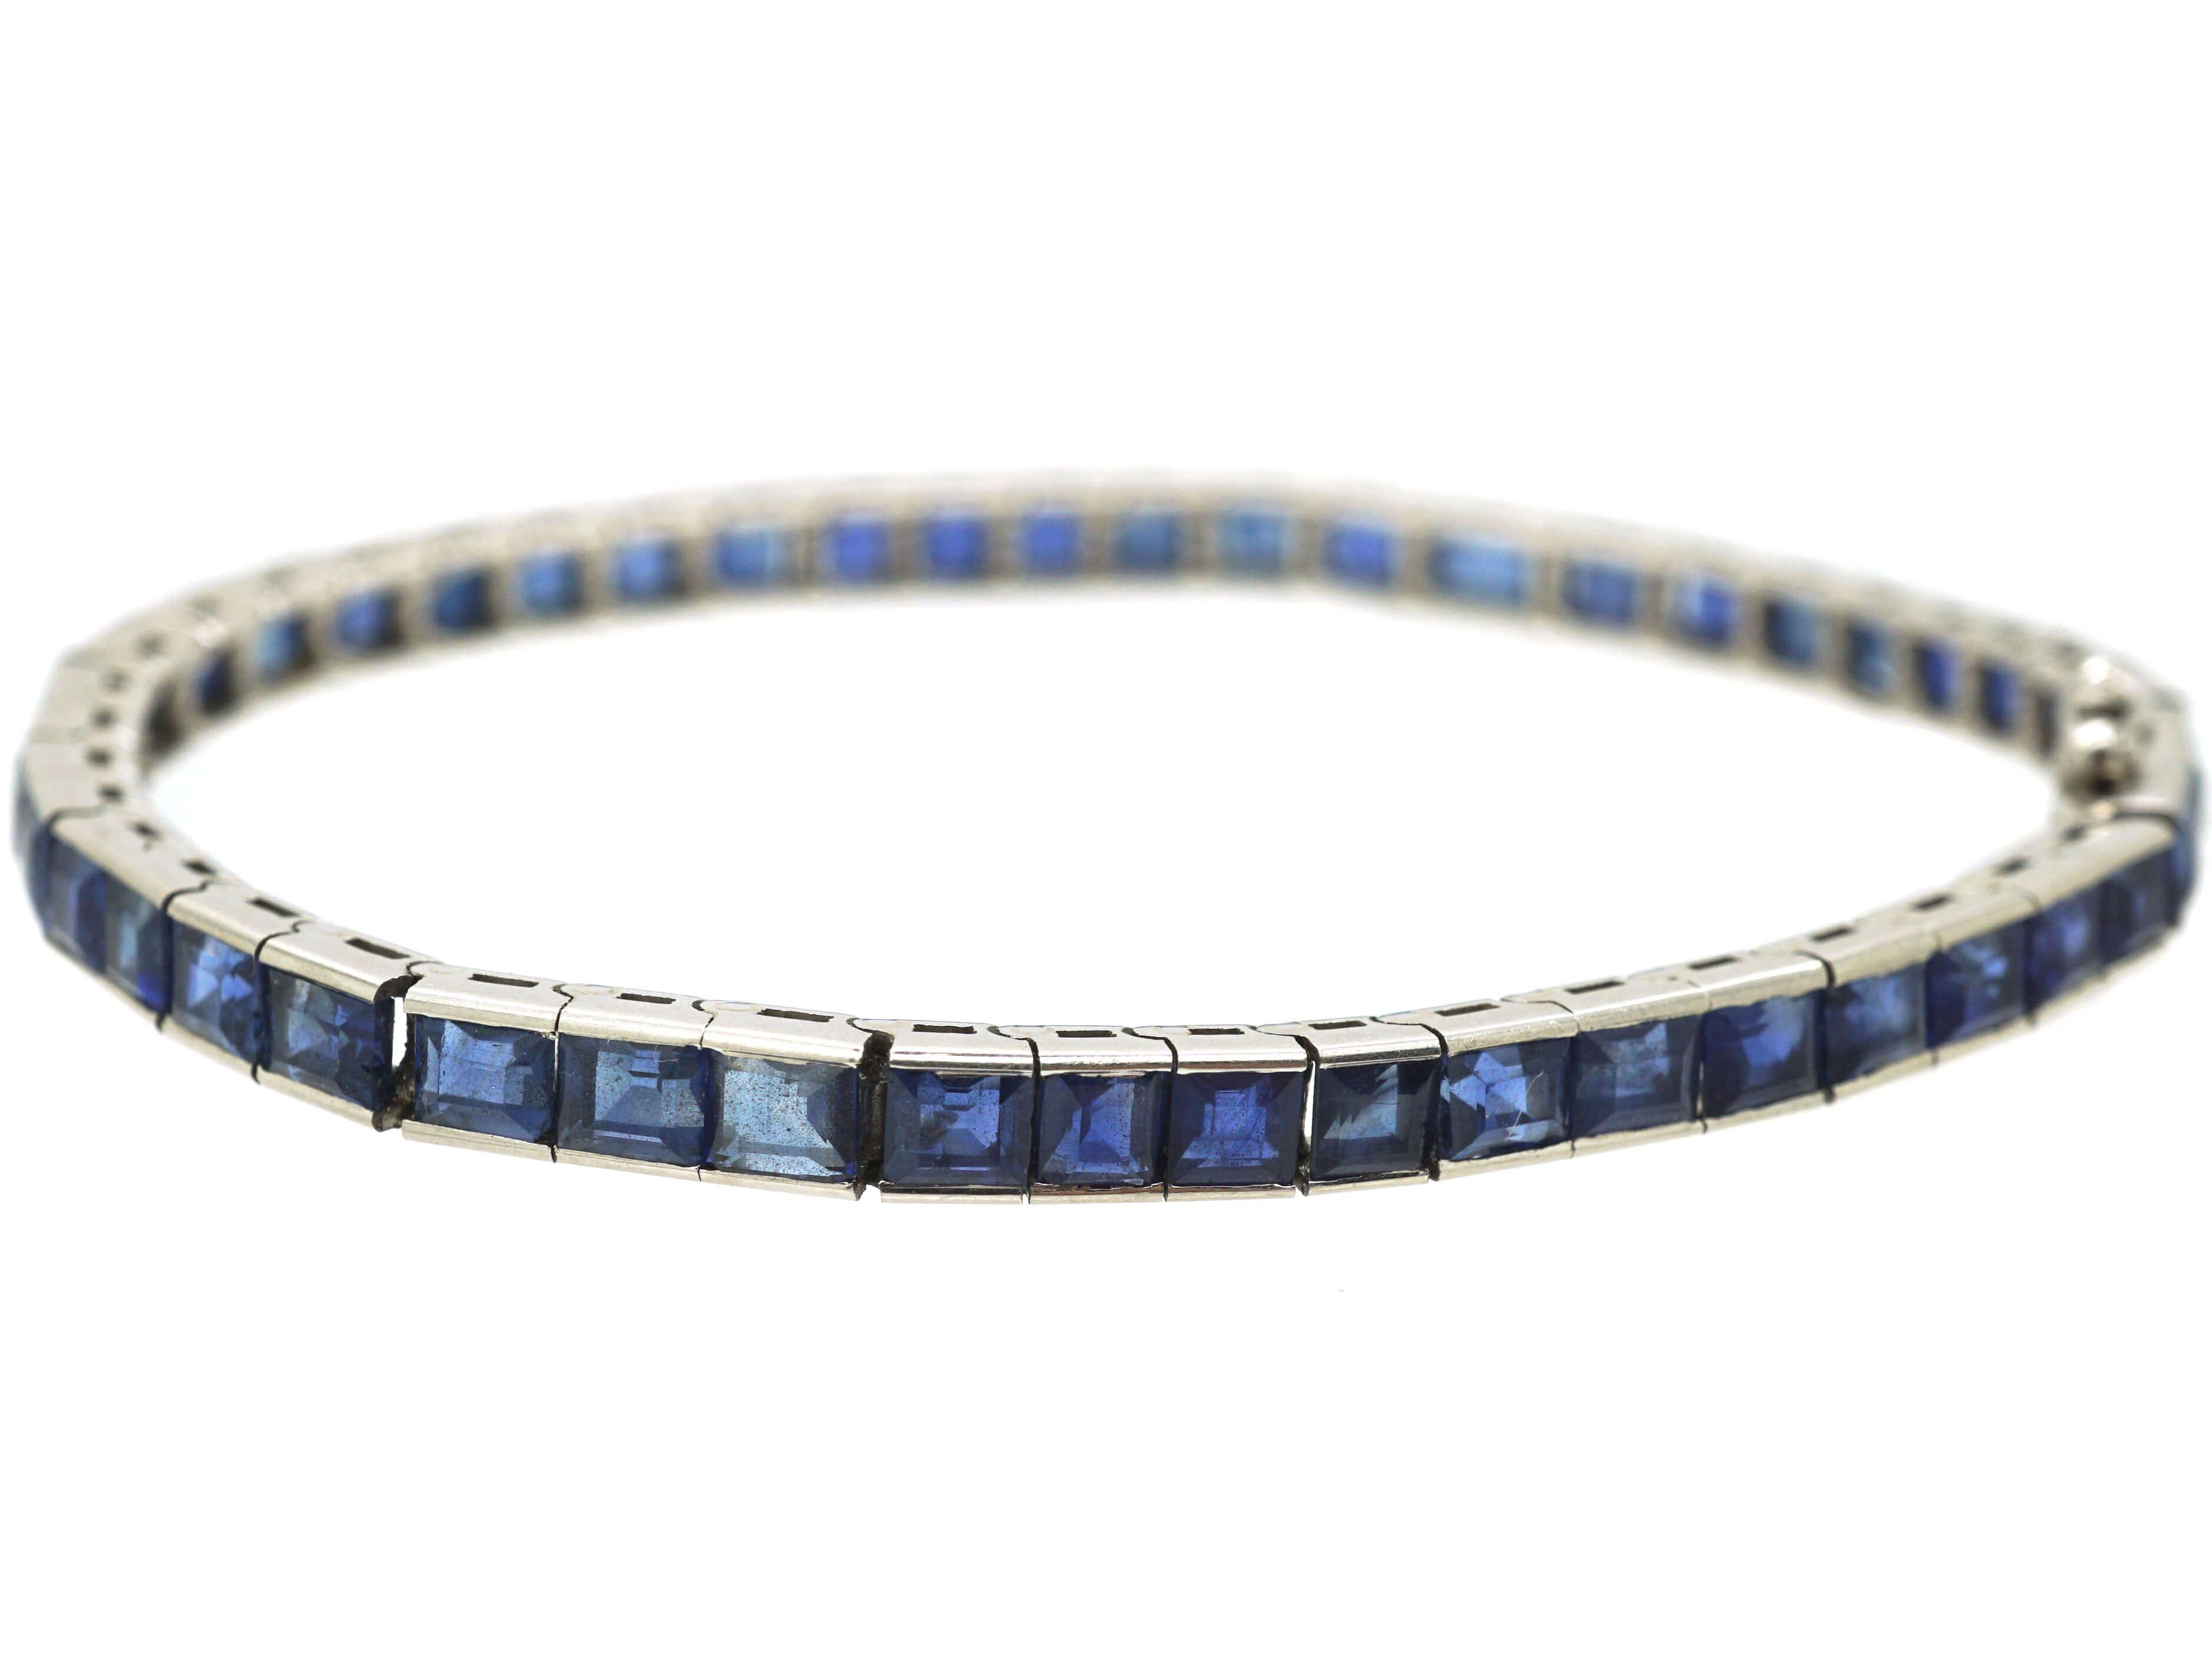 French Art Deco 18ct White Gold, Sapphire Line Bracelet